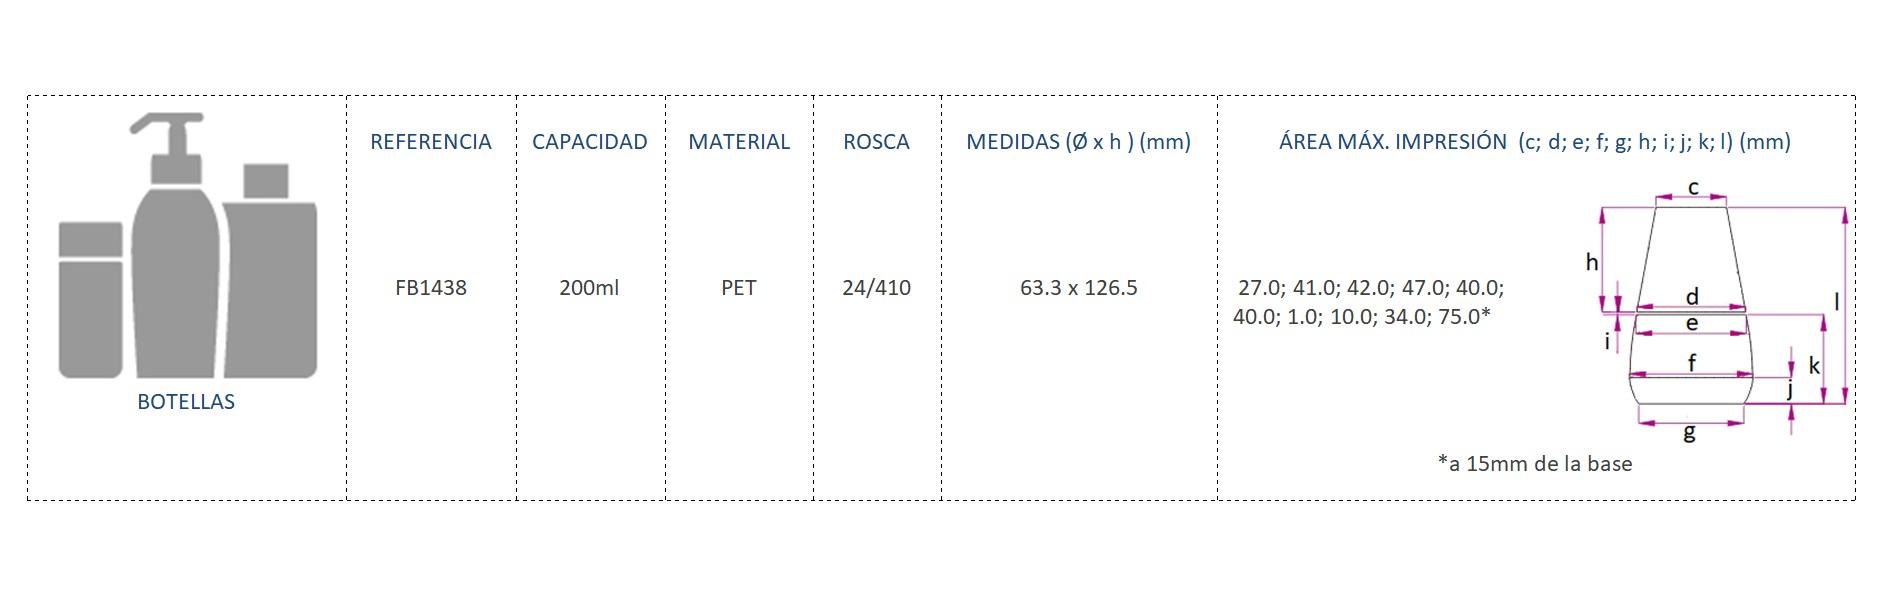 Cuadro de materiales botella FB1438